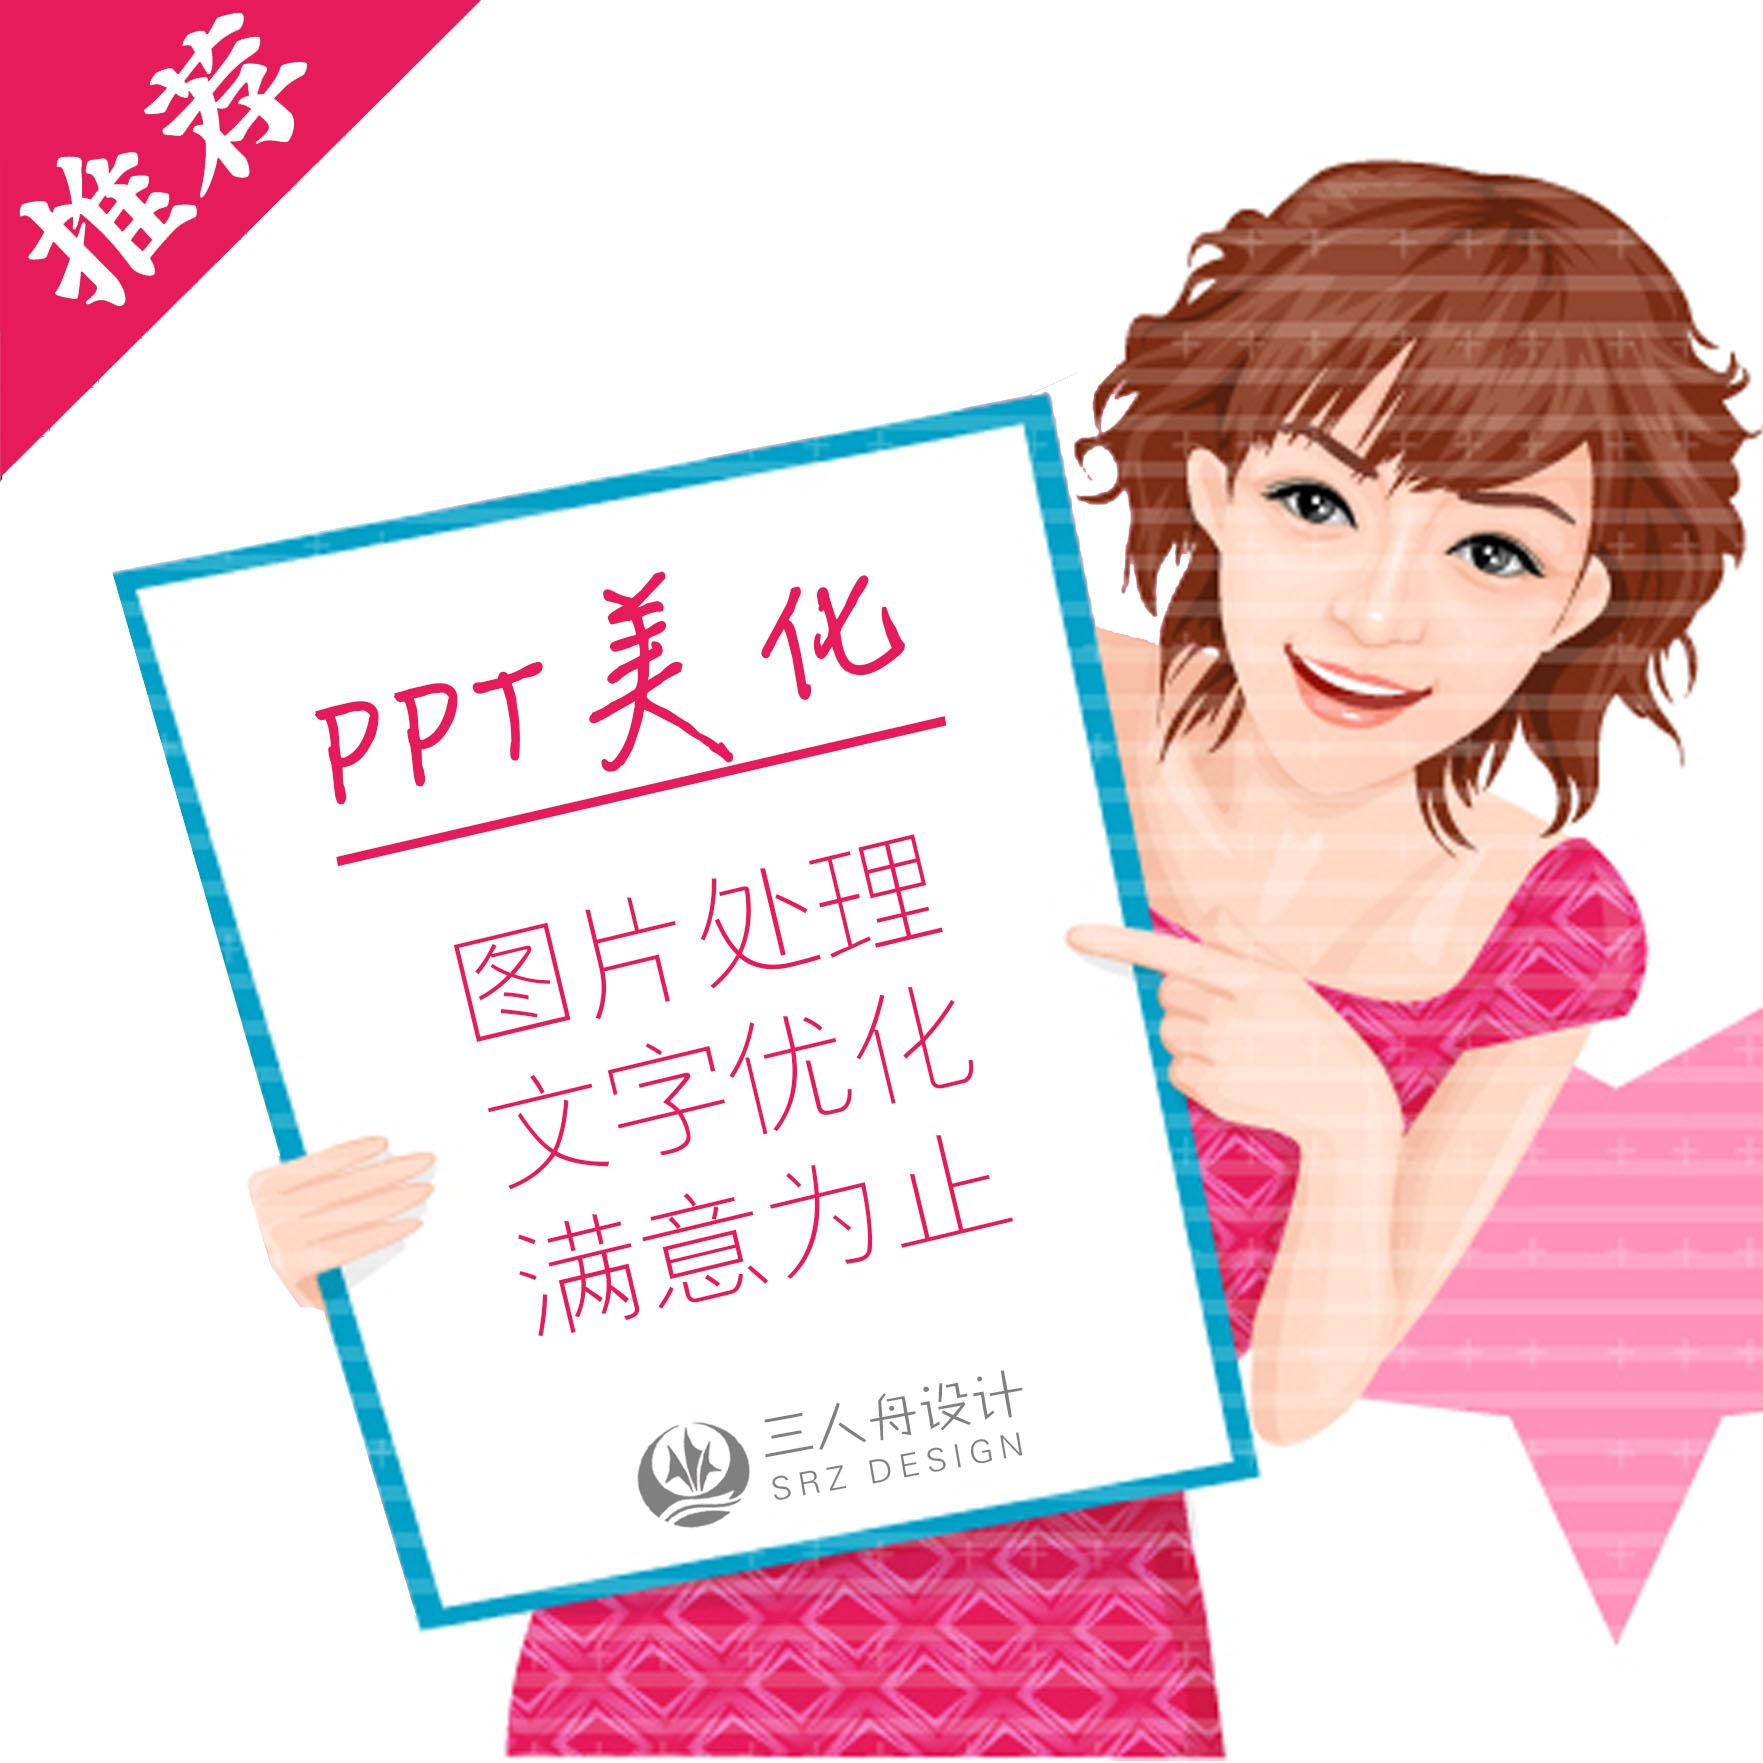 PPT美化